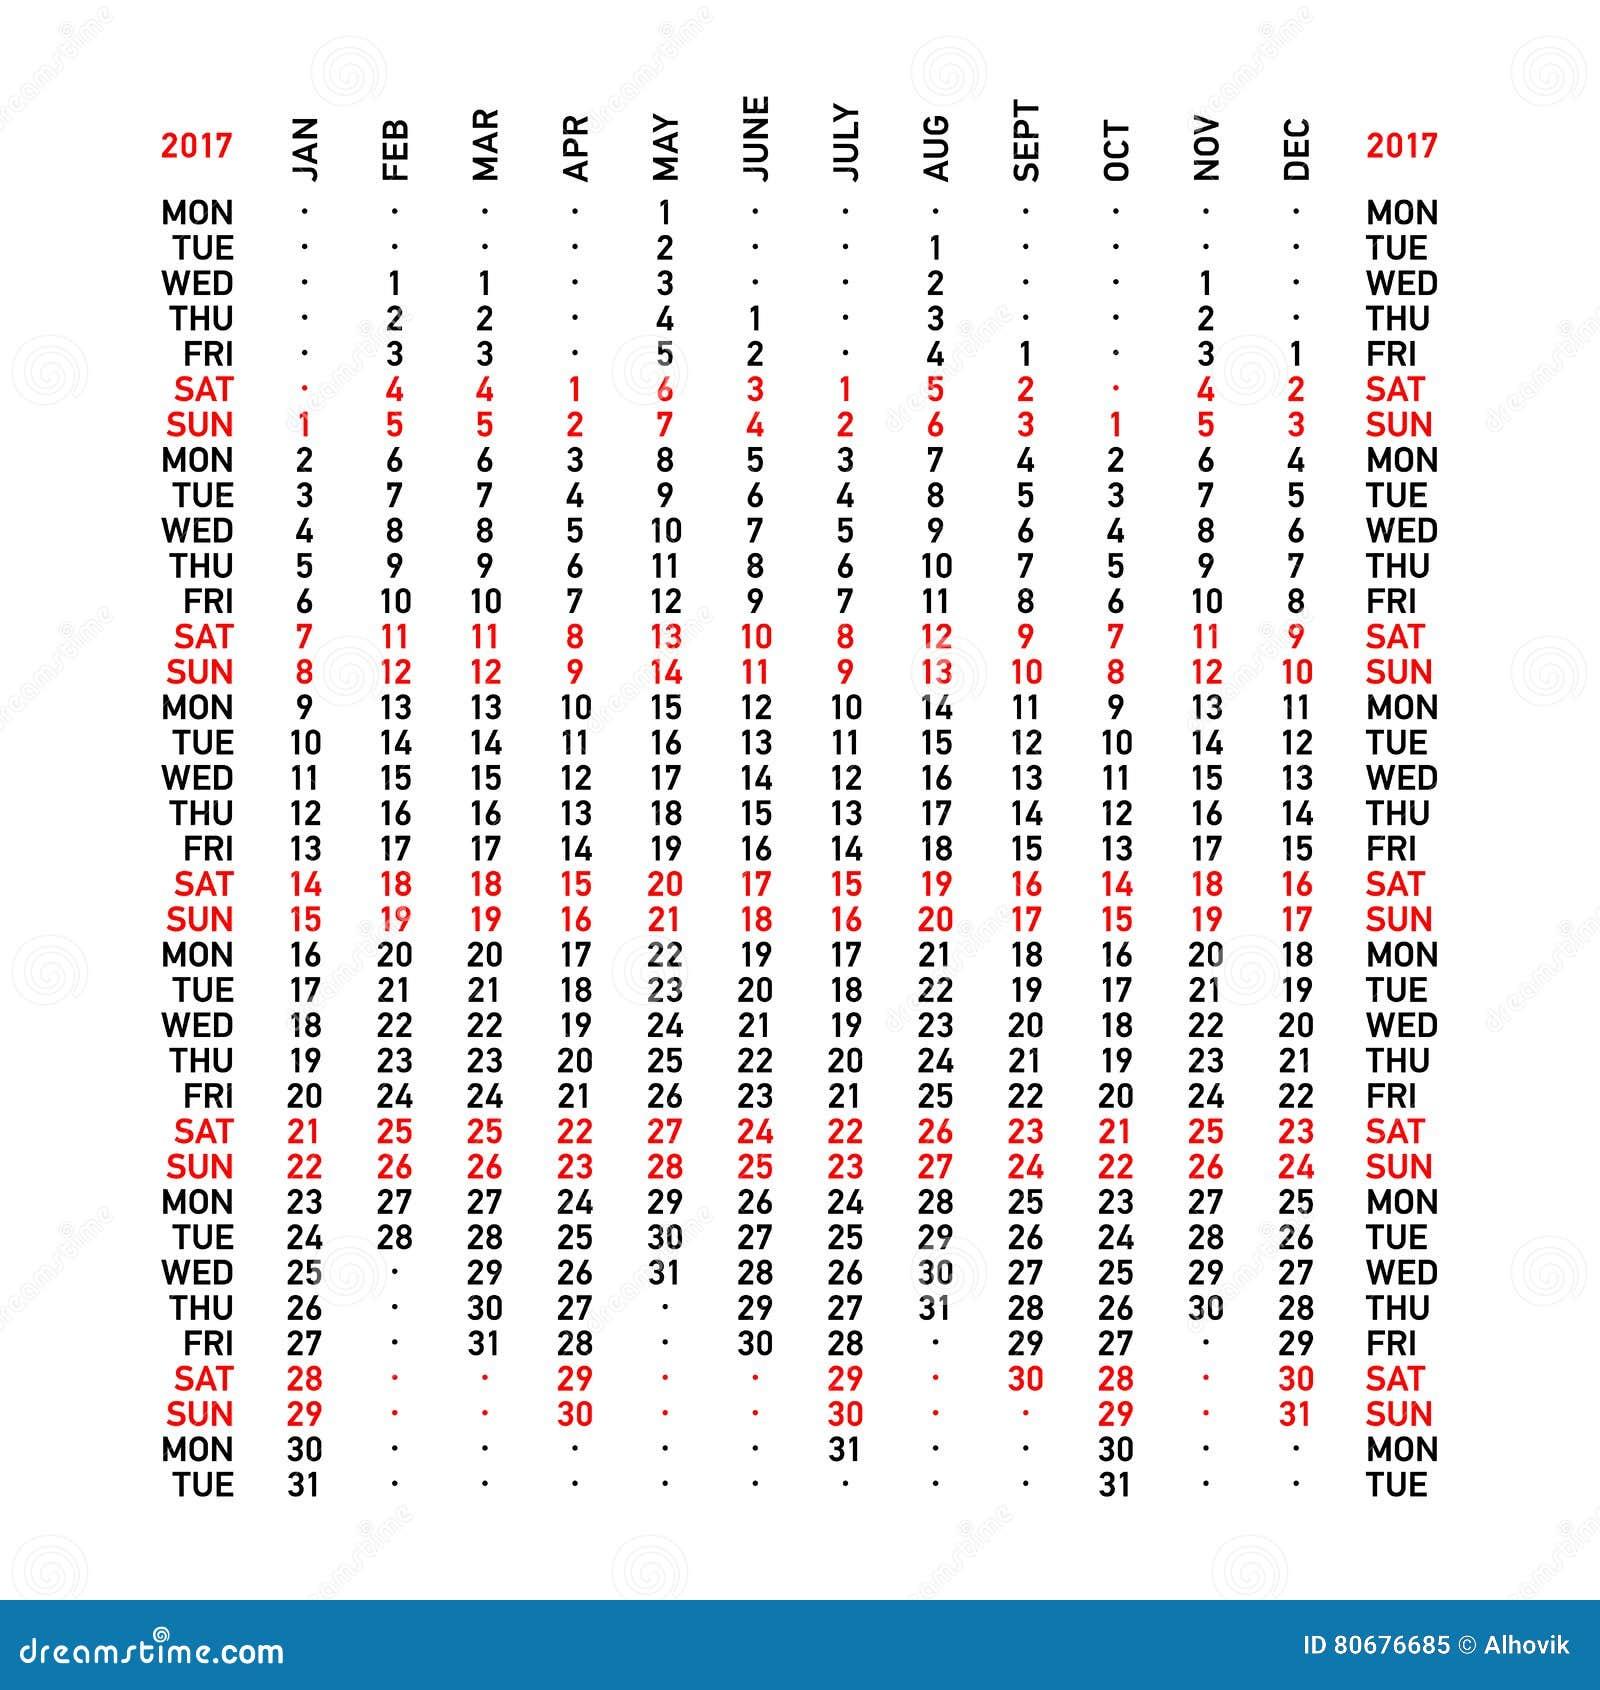 Vertical Calendar 2017 Stock Vector - Image: 80676685